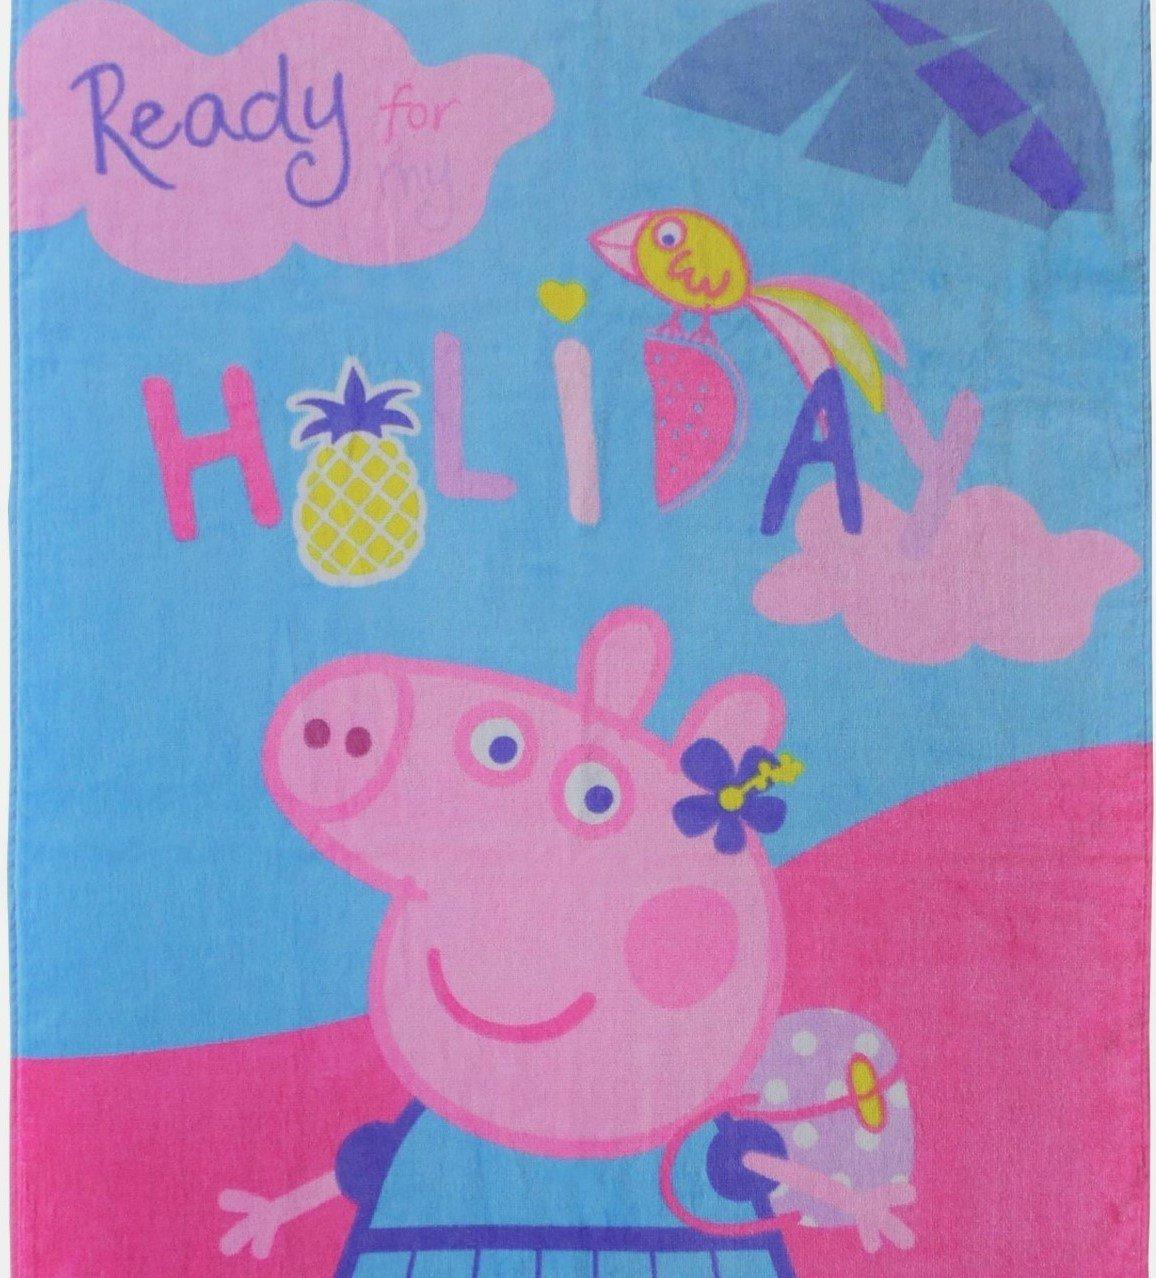 Peppa Pig Toalla De Playa · Peppa Pig Holiday Toalla · Rosa, Azul · 70 x 120 cm · 100% algodón: Amazon.es: Hogar